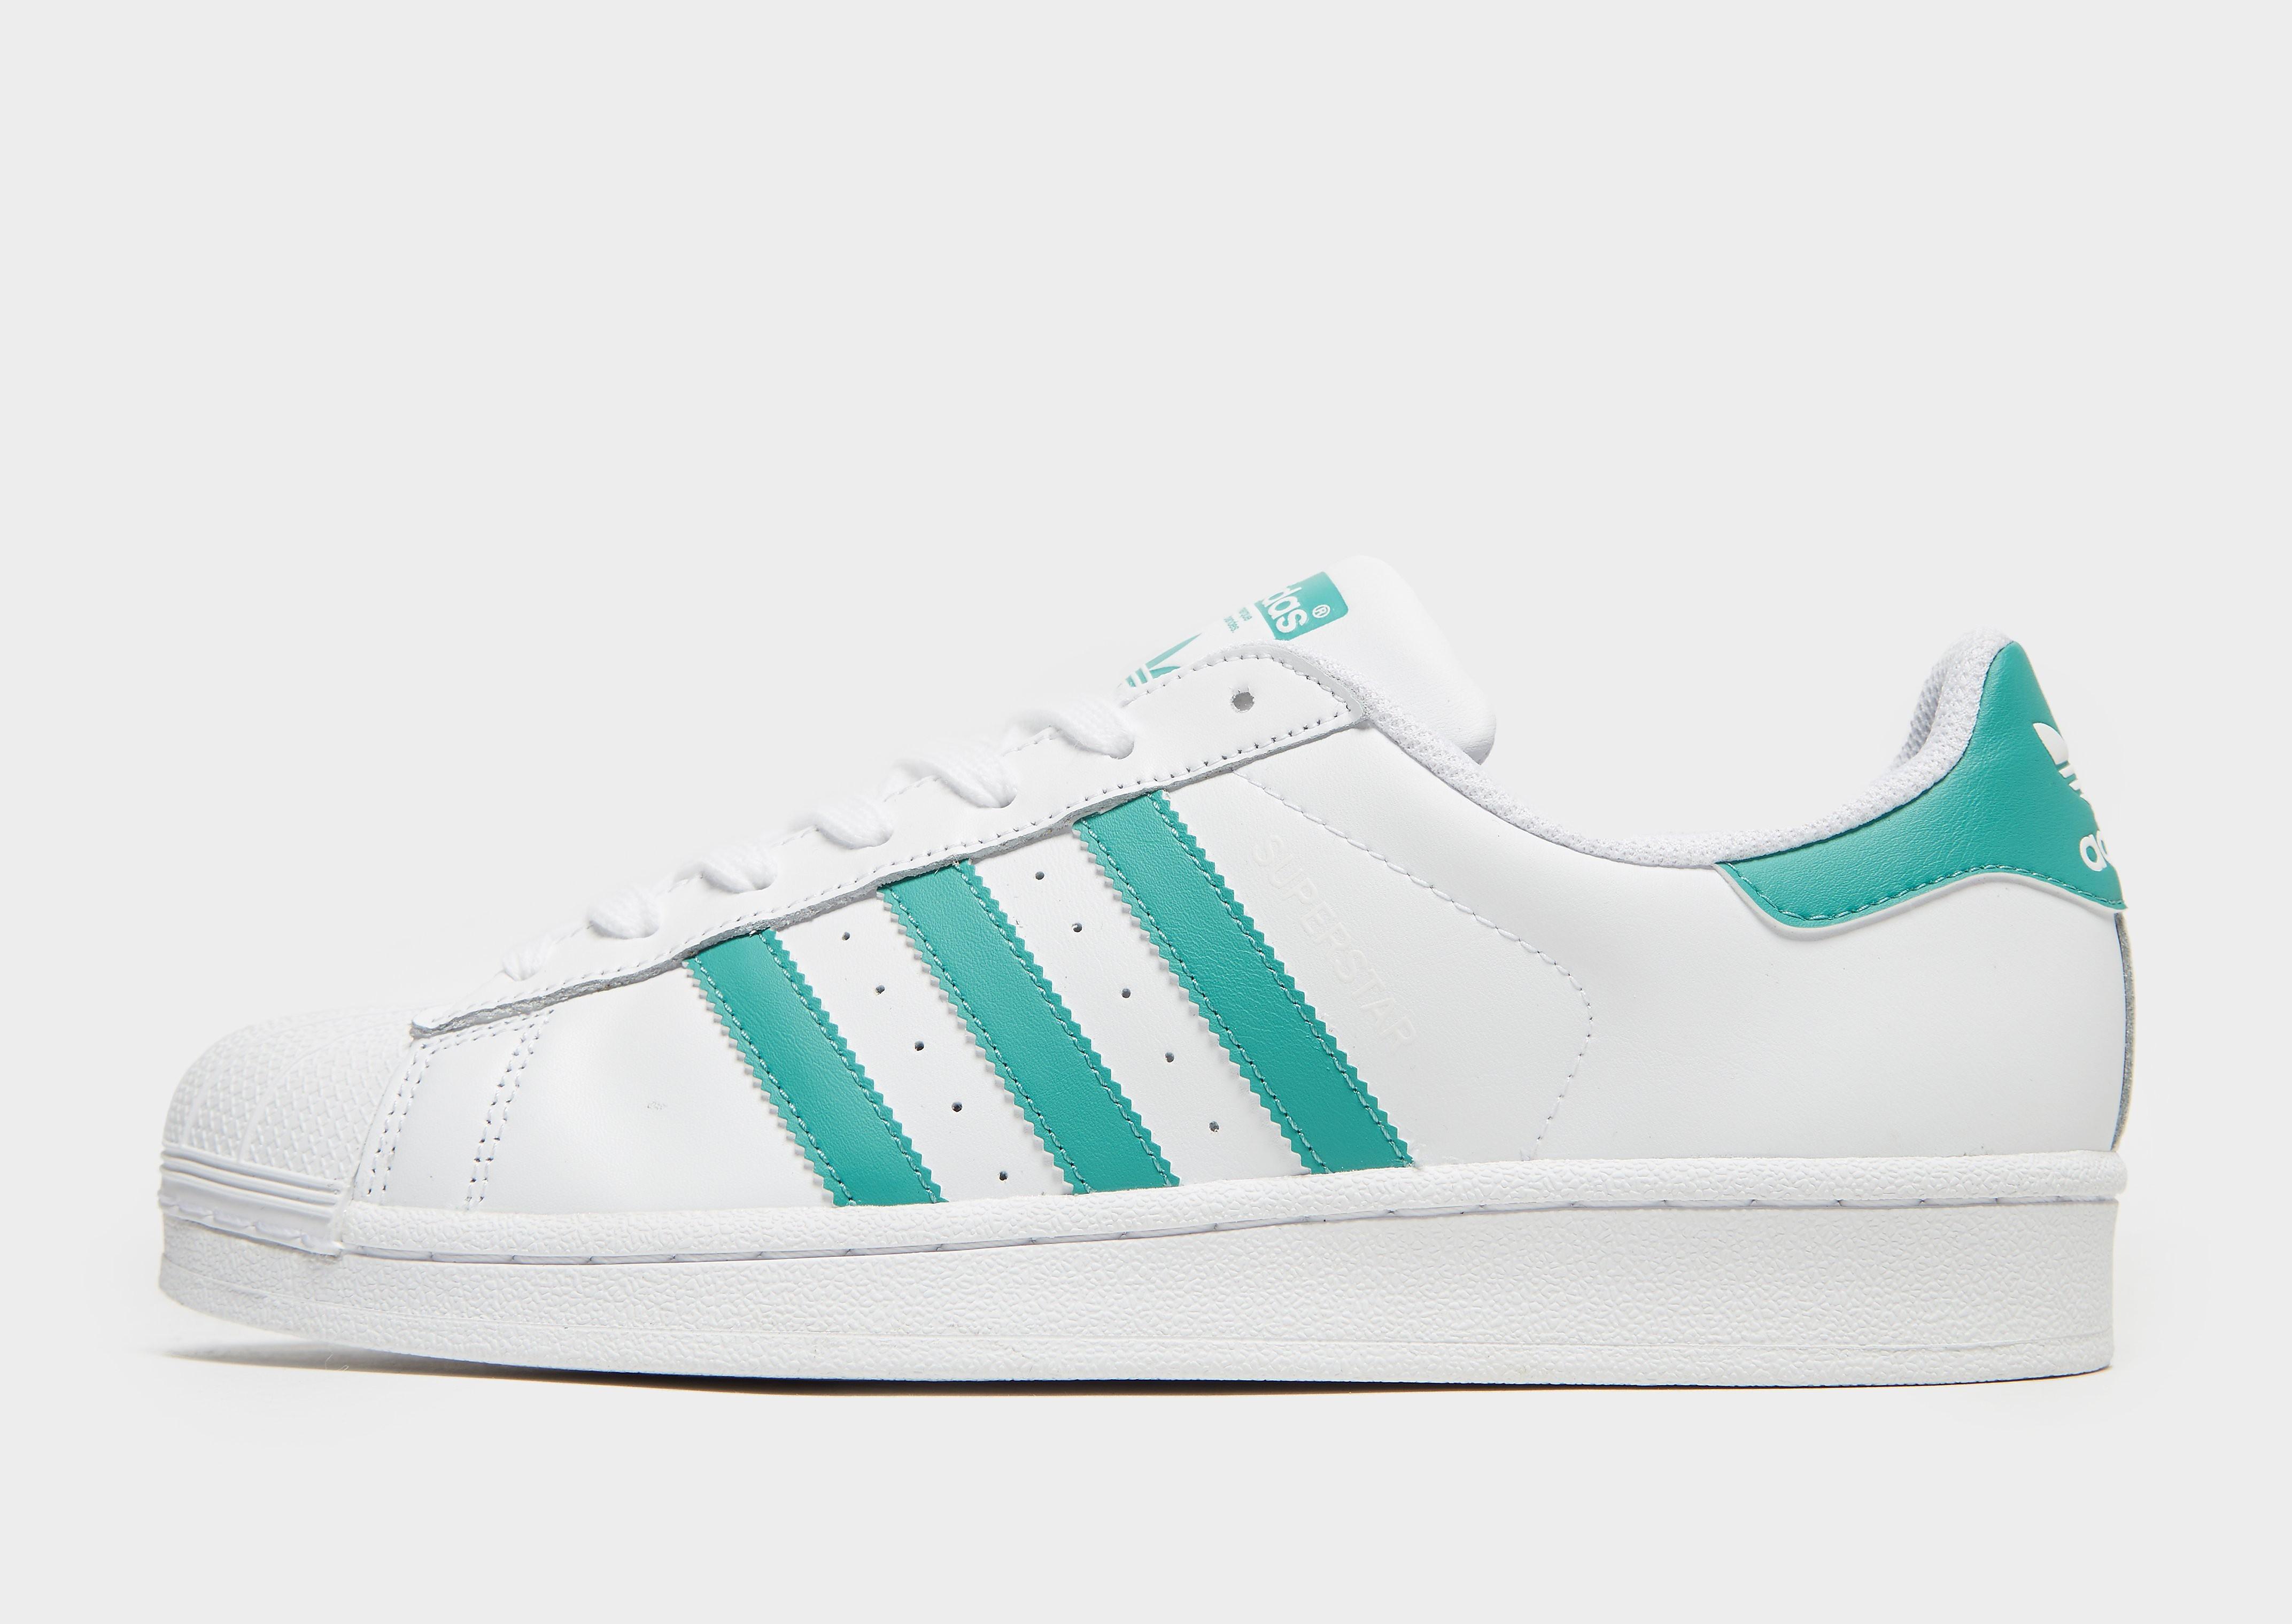 Adidas Superstar herensneaker groen en wit